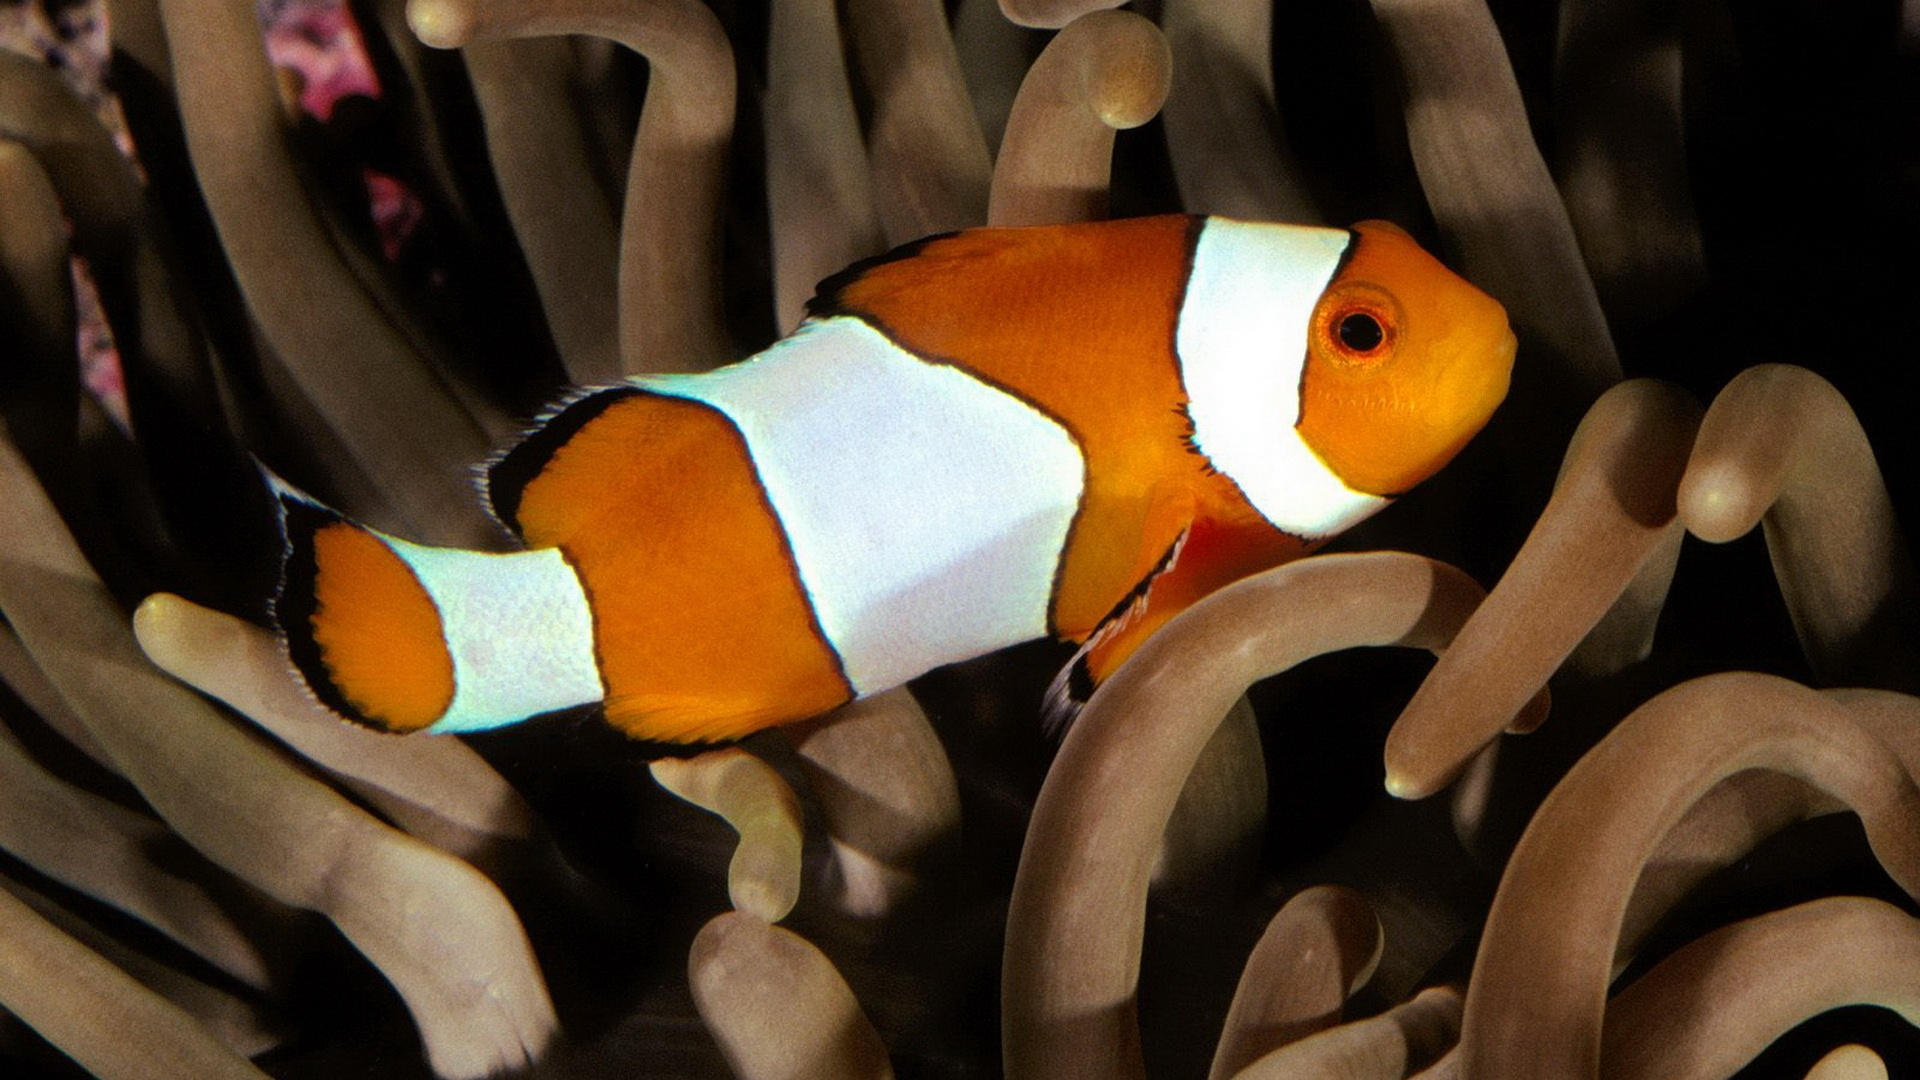 Clown-Fish-1080p-HD-wallpaper-wpc5803545